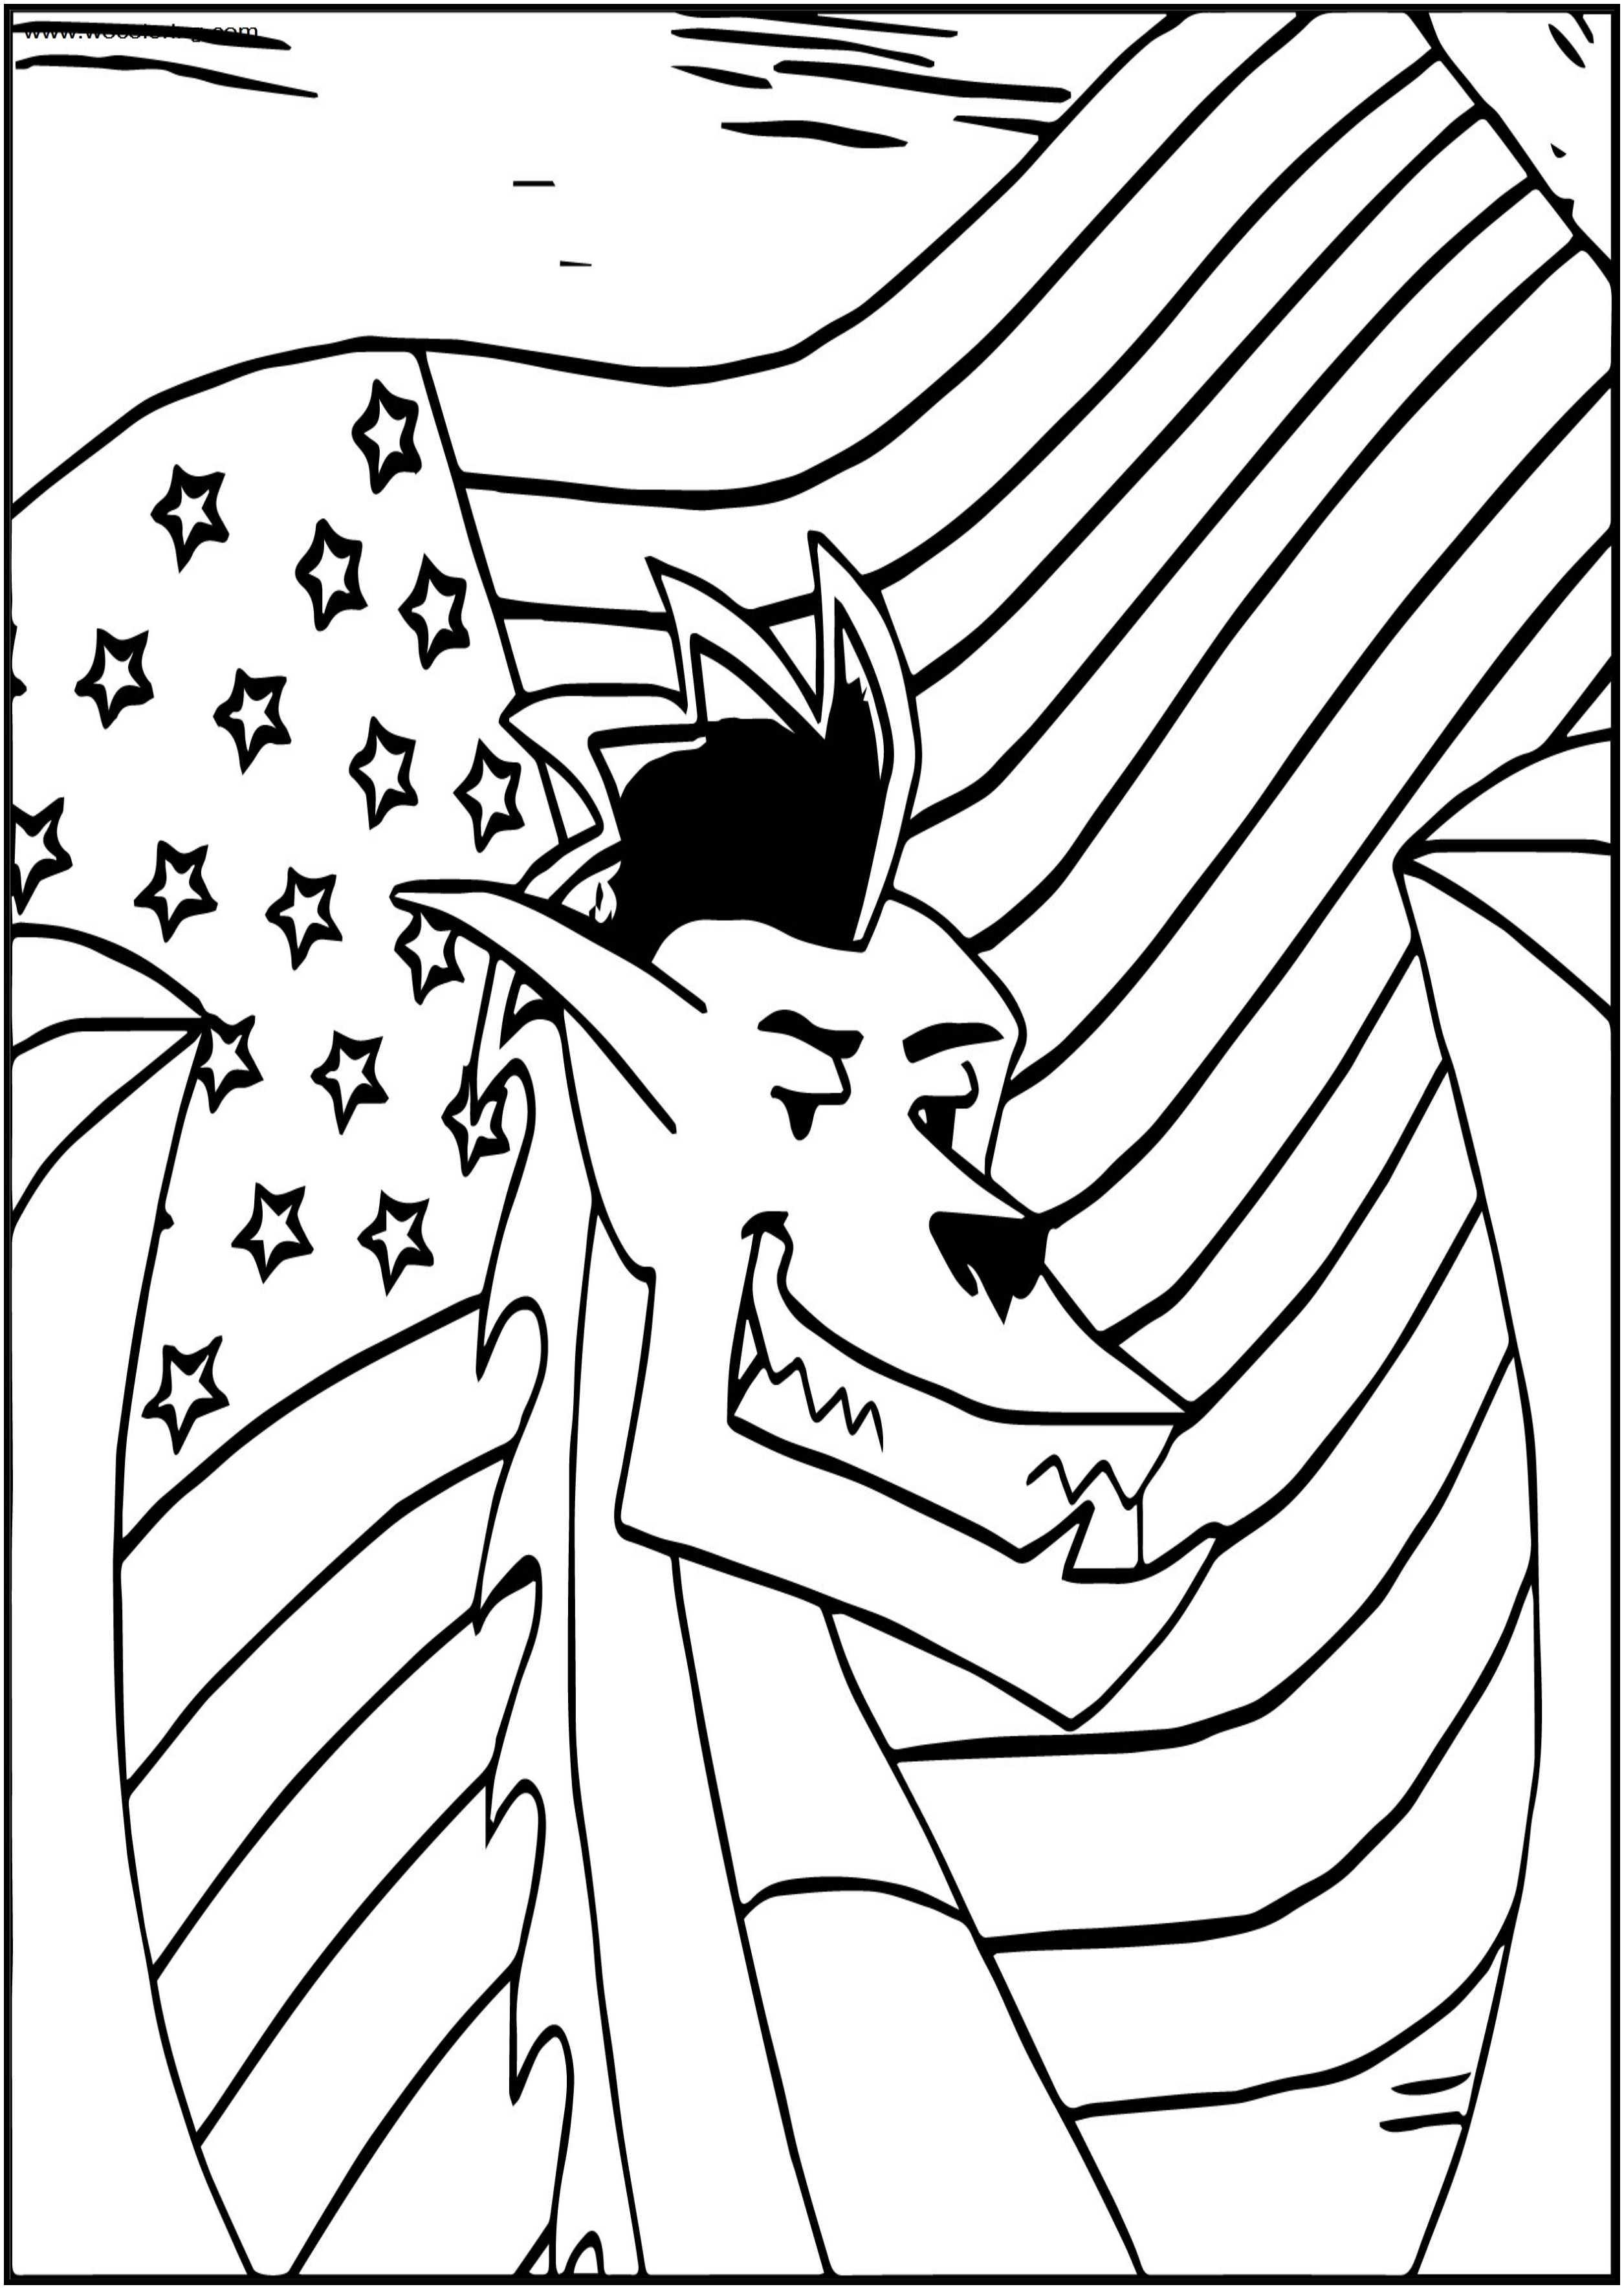 The American Dragon Poke Yoshi Free A4 Printable Coloring Page